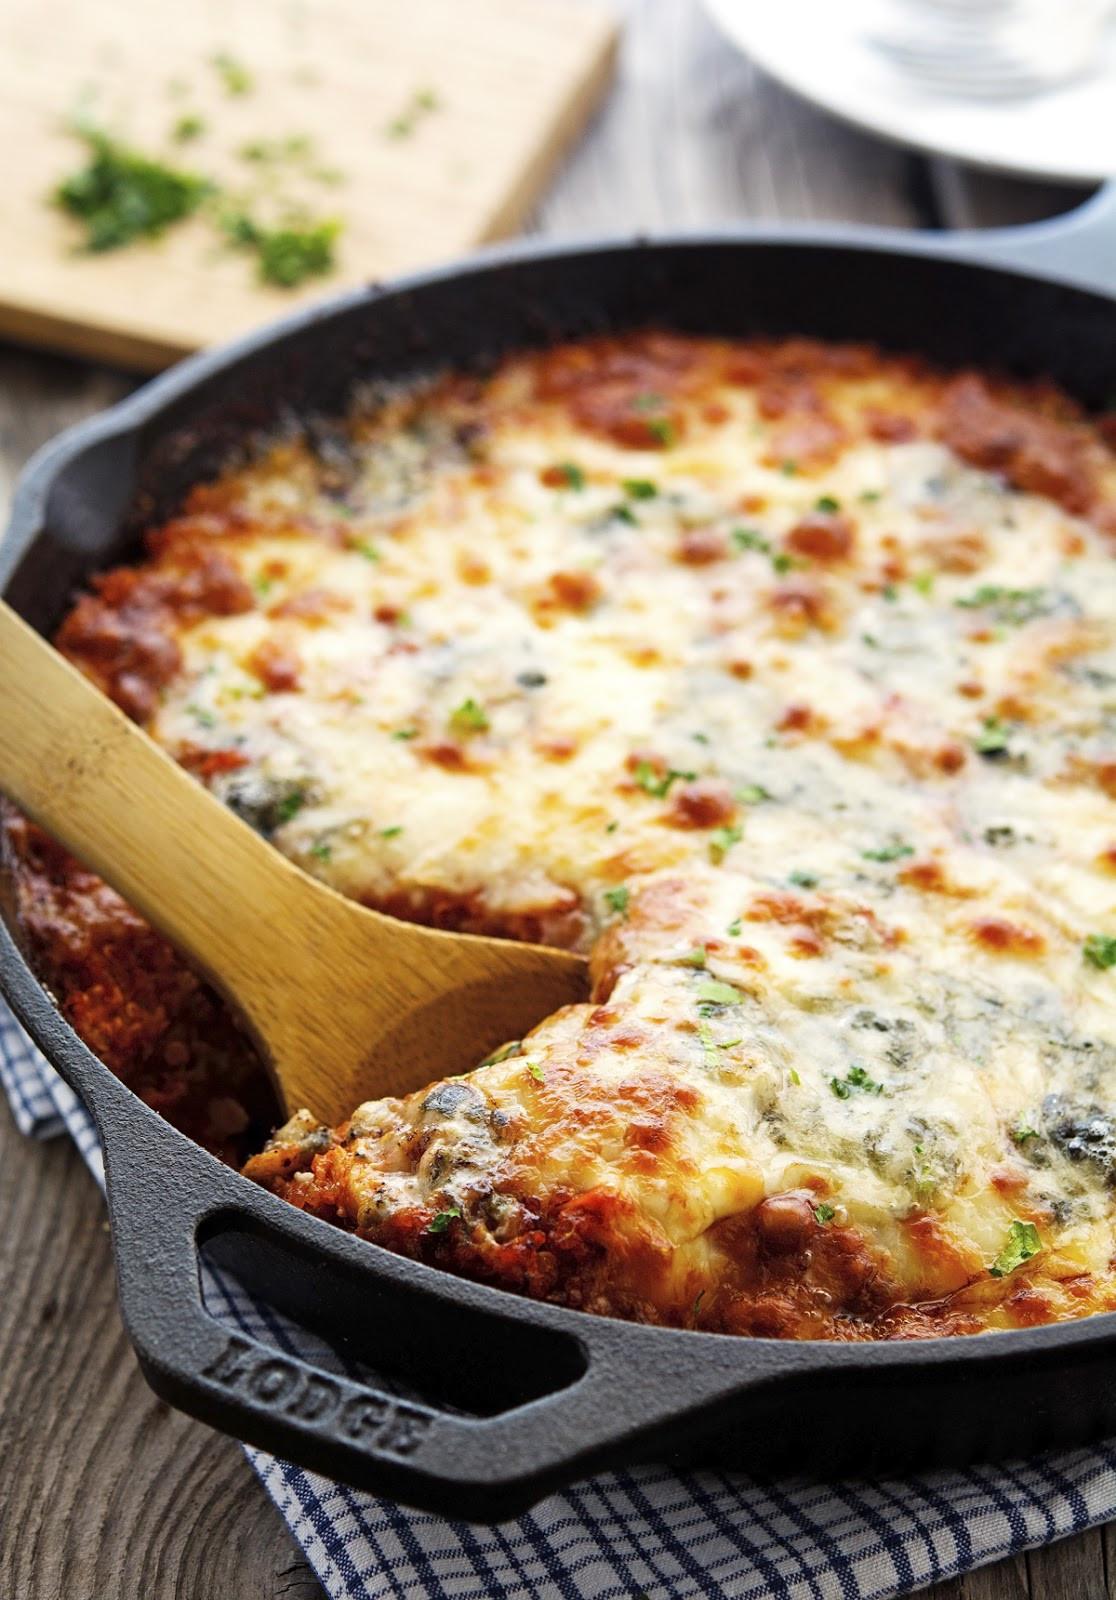 Quinoa Recipes With Chicken  The Iron You Buffalo Chicken Quinoa Casserole